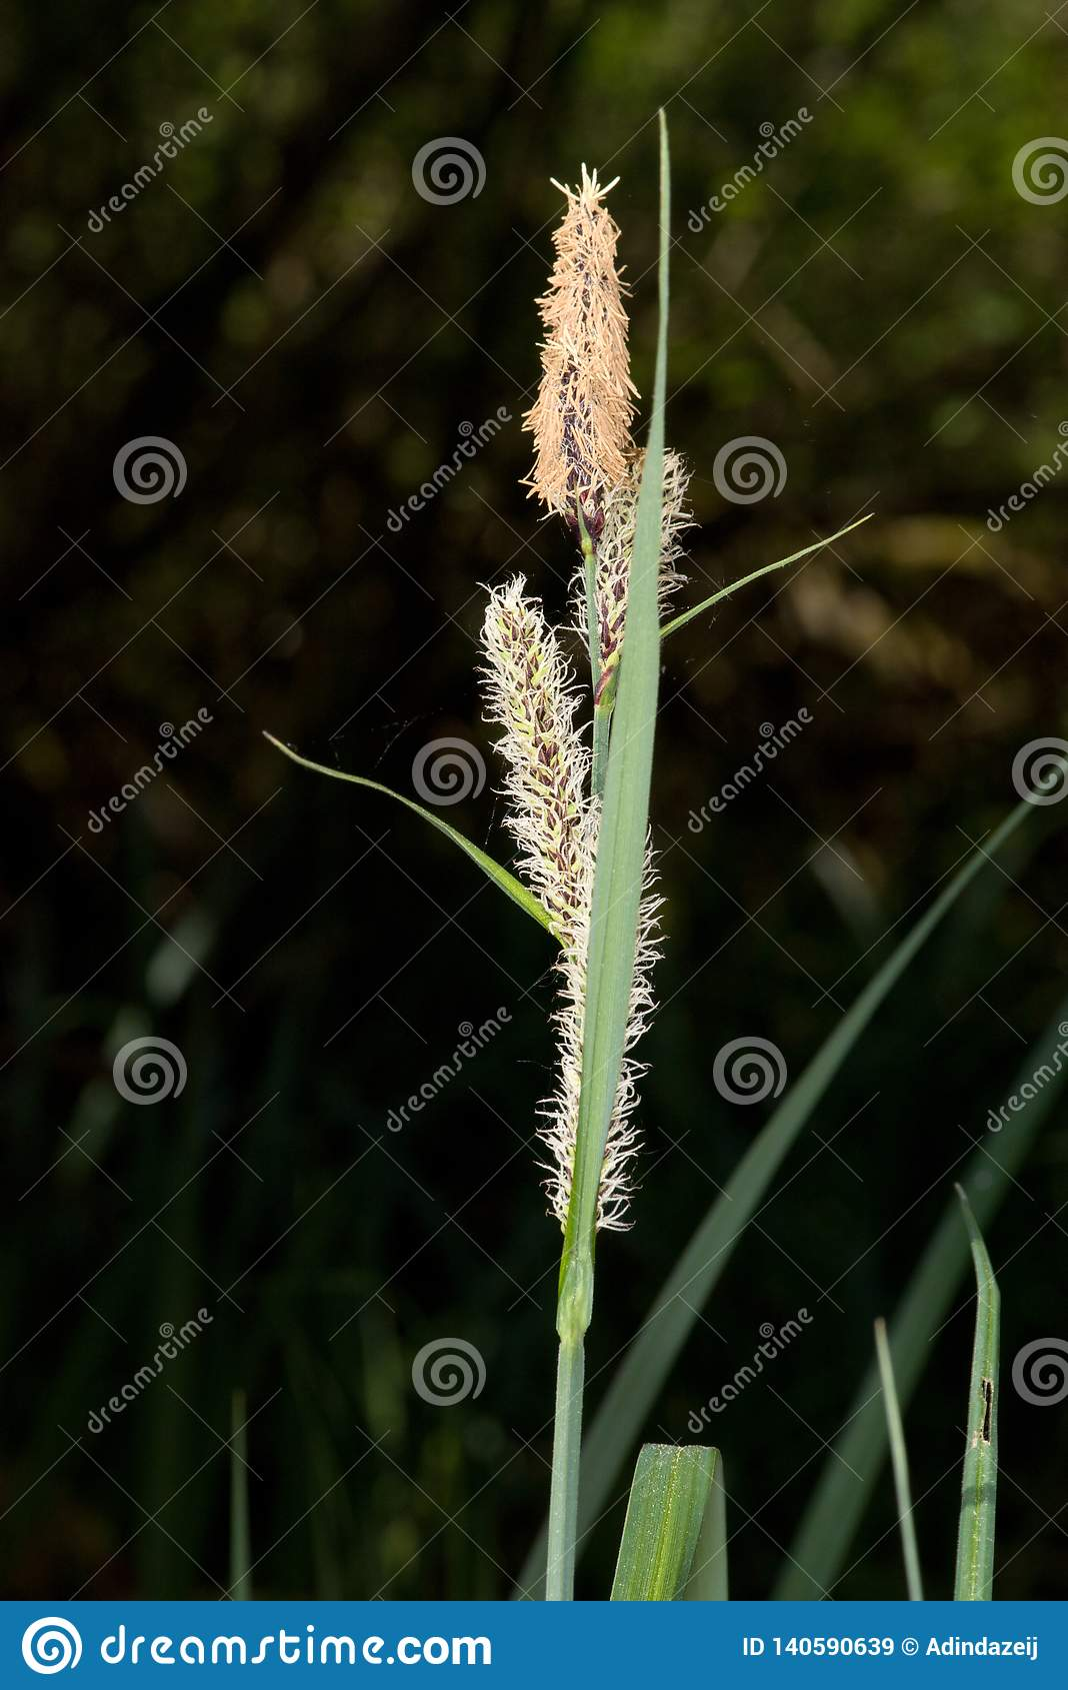 Closeup of grass with pollen